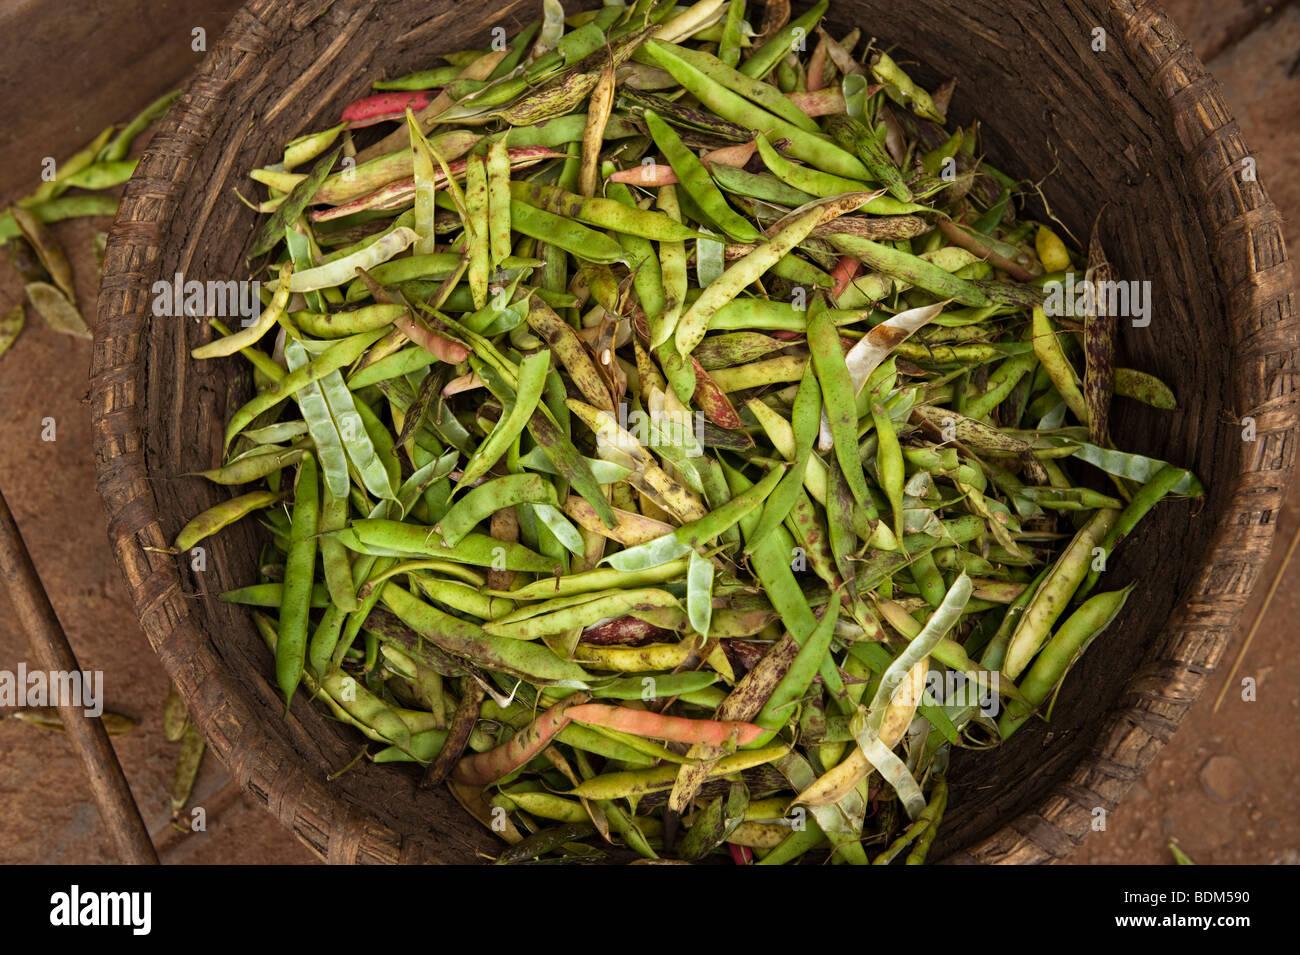 peas for sale in the market, Kigali, Rwanda - Stock Image